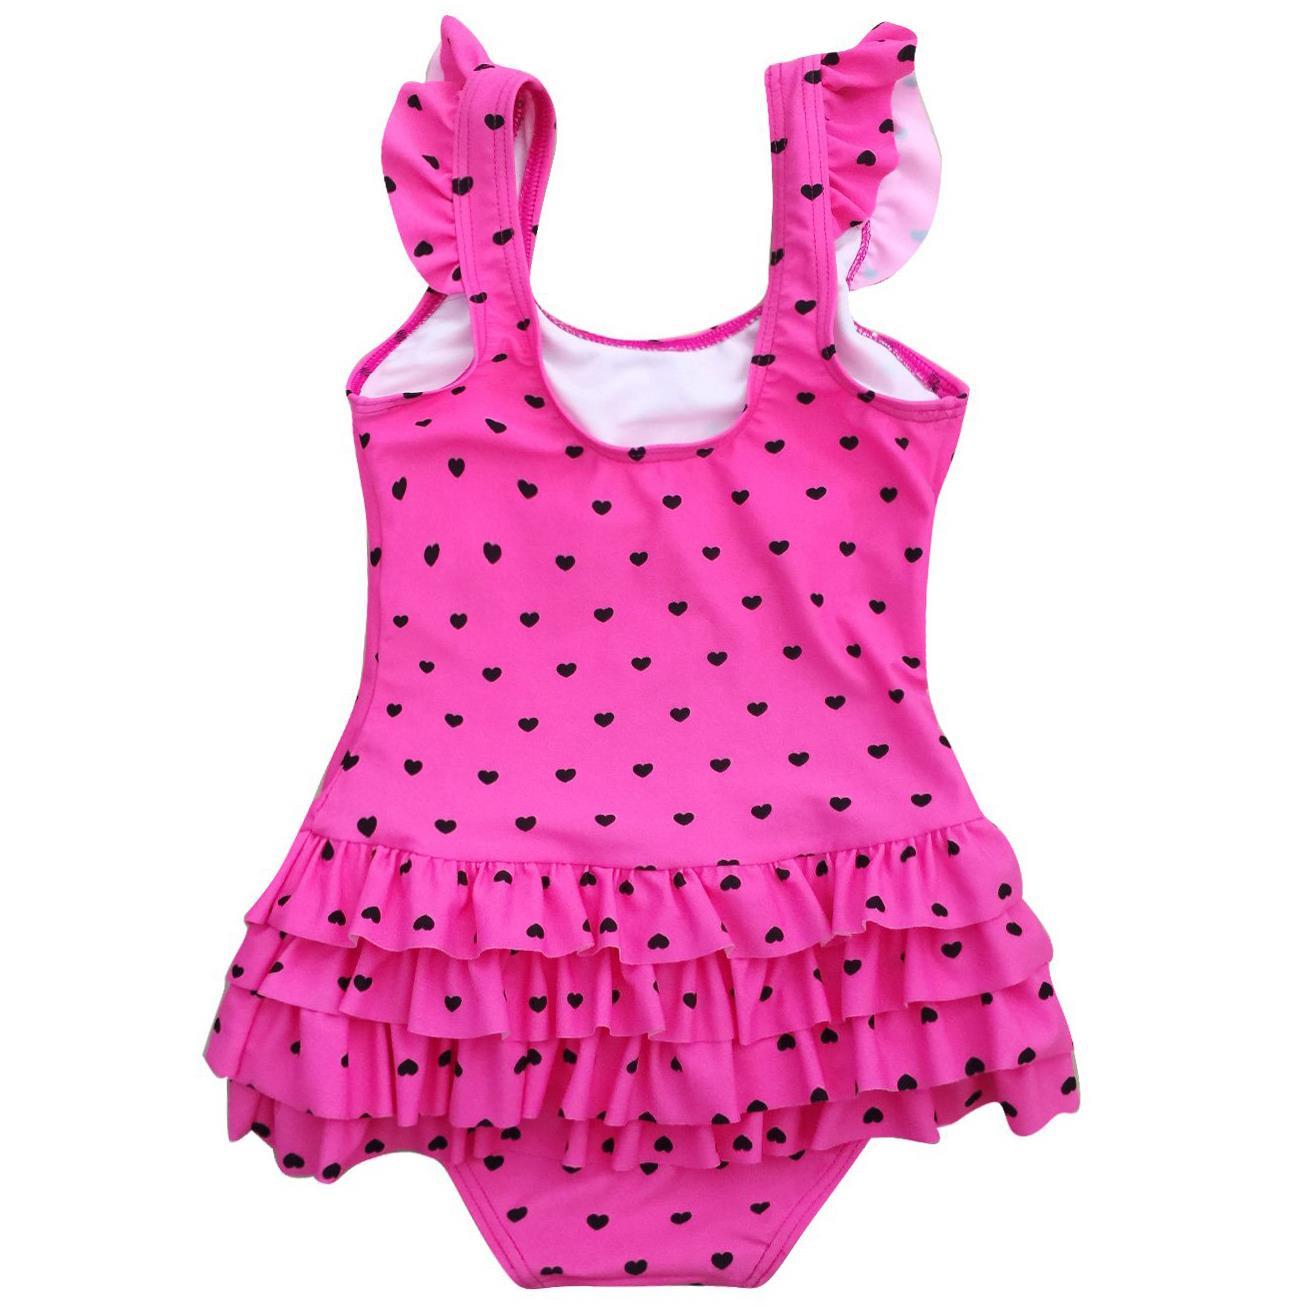 Baby girls swimsuit one piece pink-blk heart-back.jpg